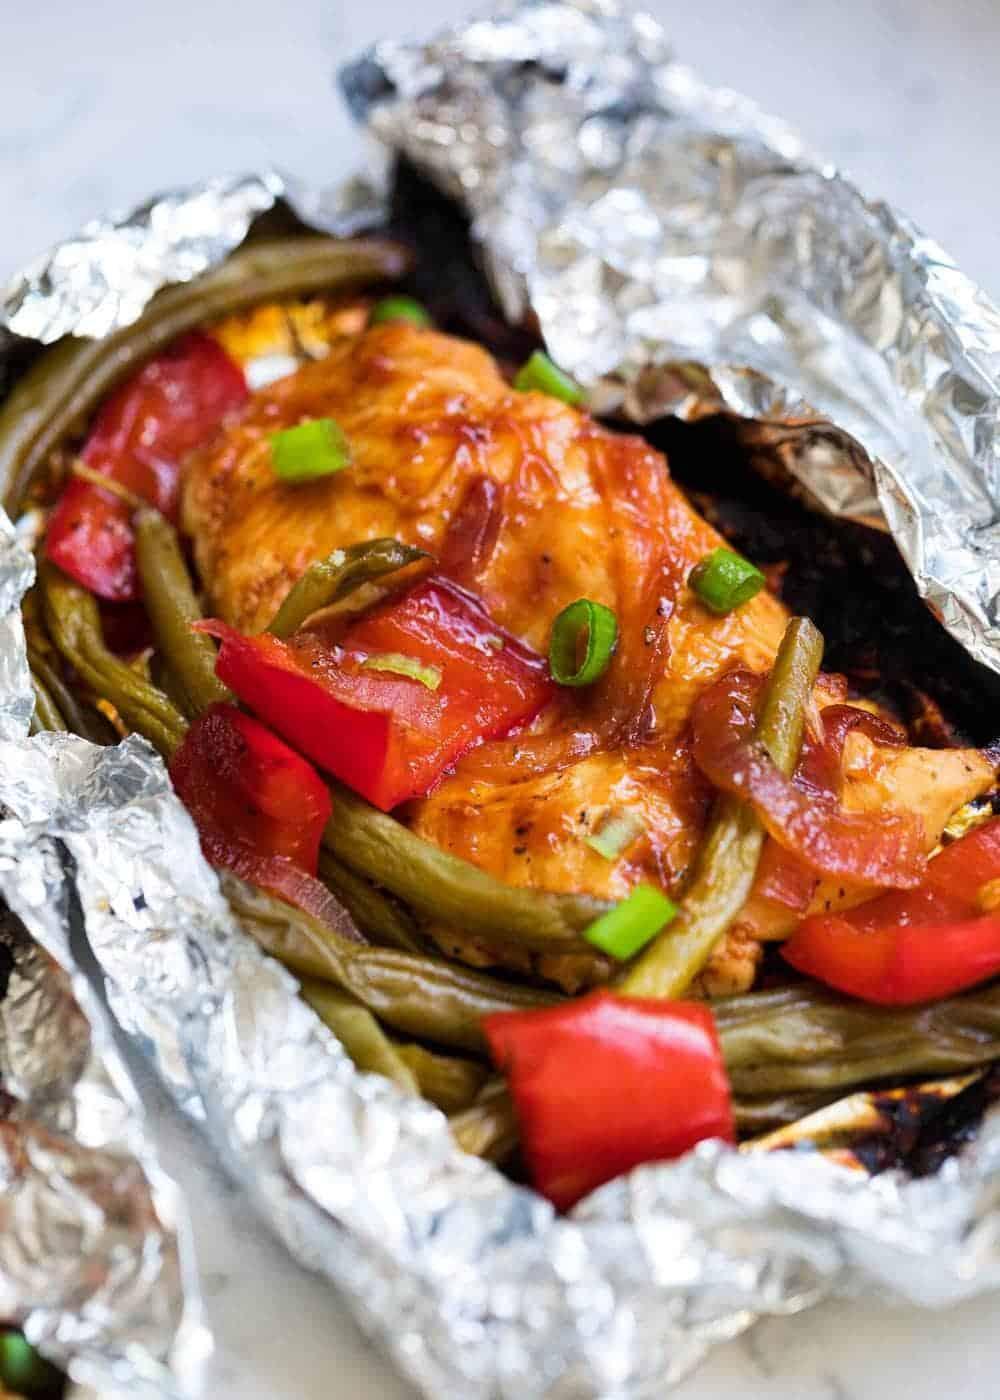 Grilled Bbq Chicken Foil Dinner I Heart Nap Time